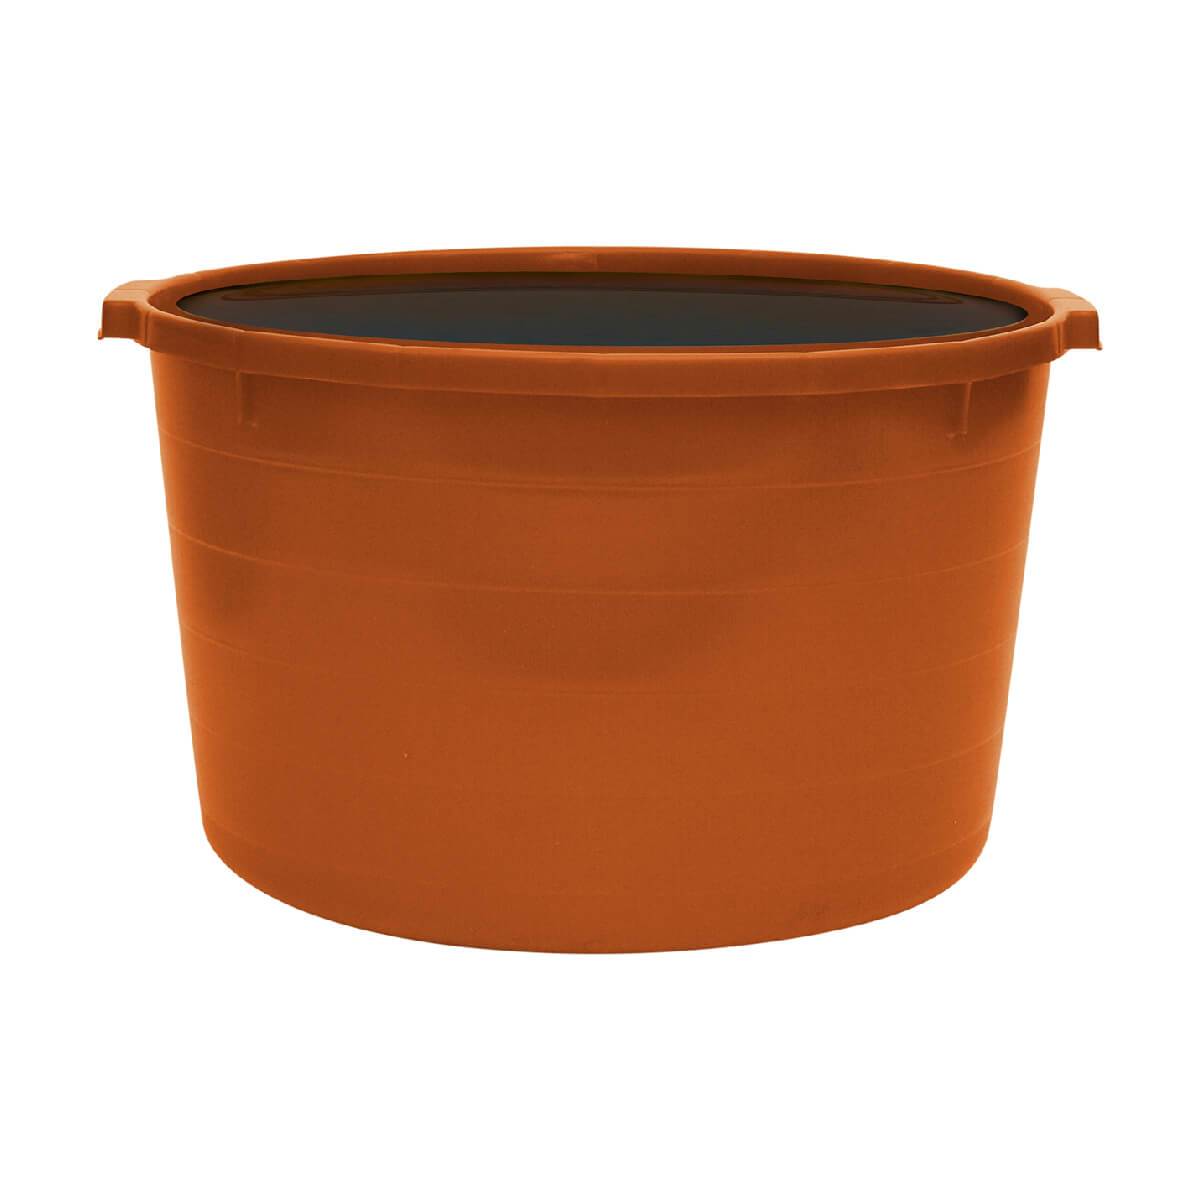 Prostock Low Moisture Tub - 16% - 56 kg